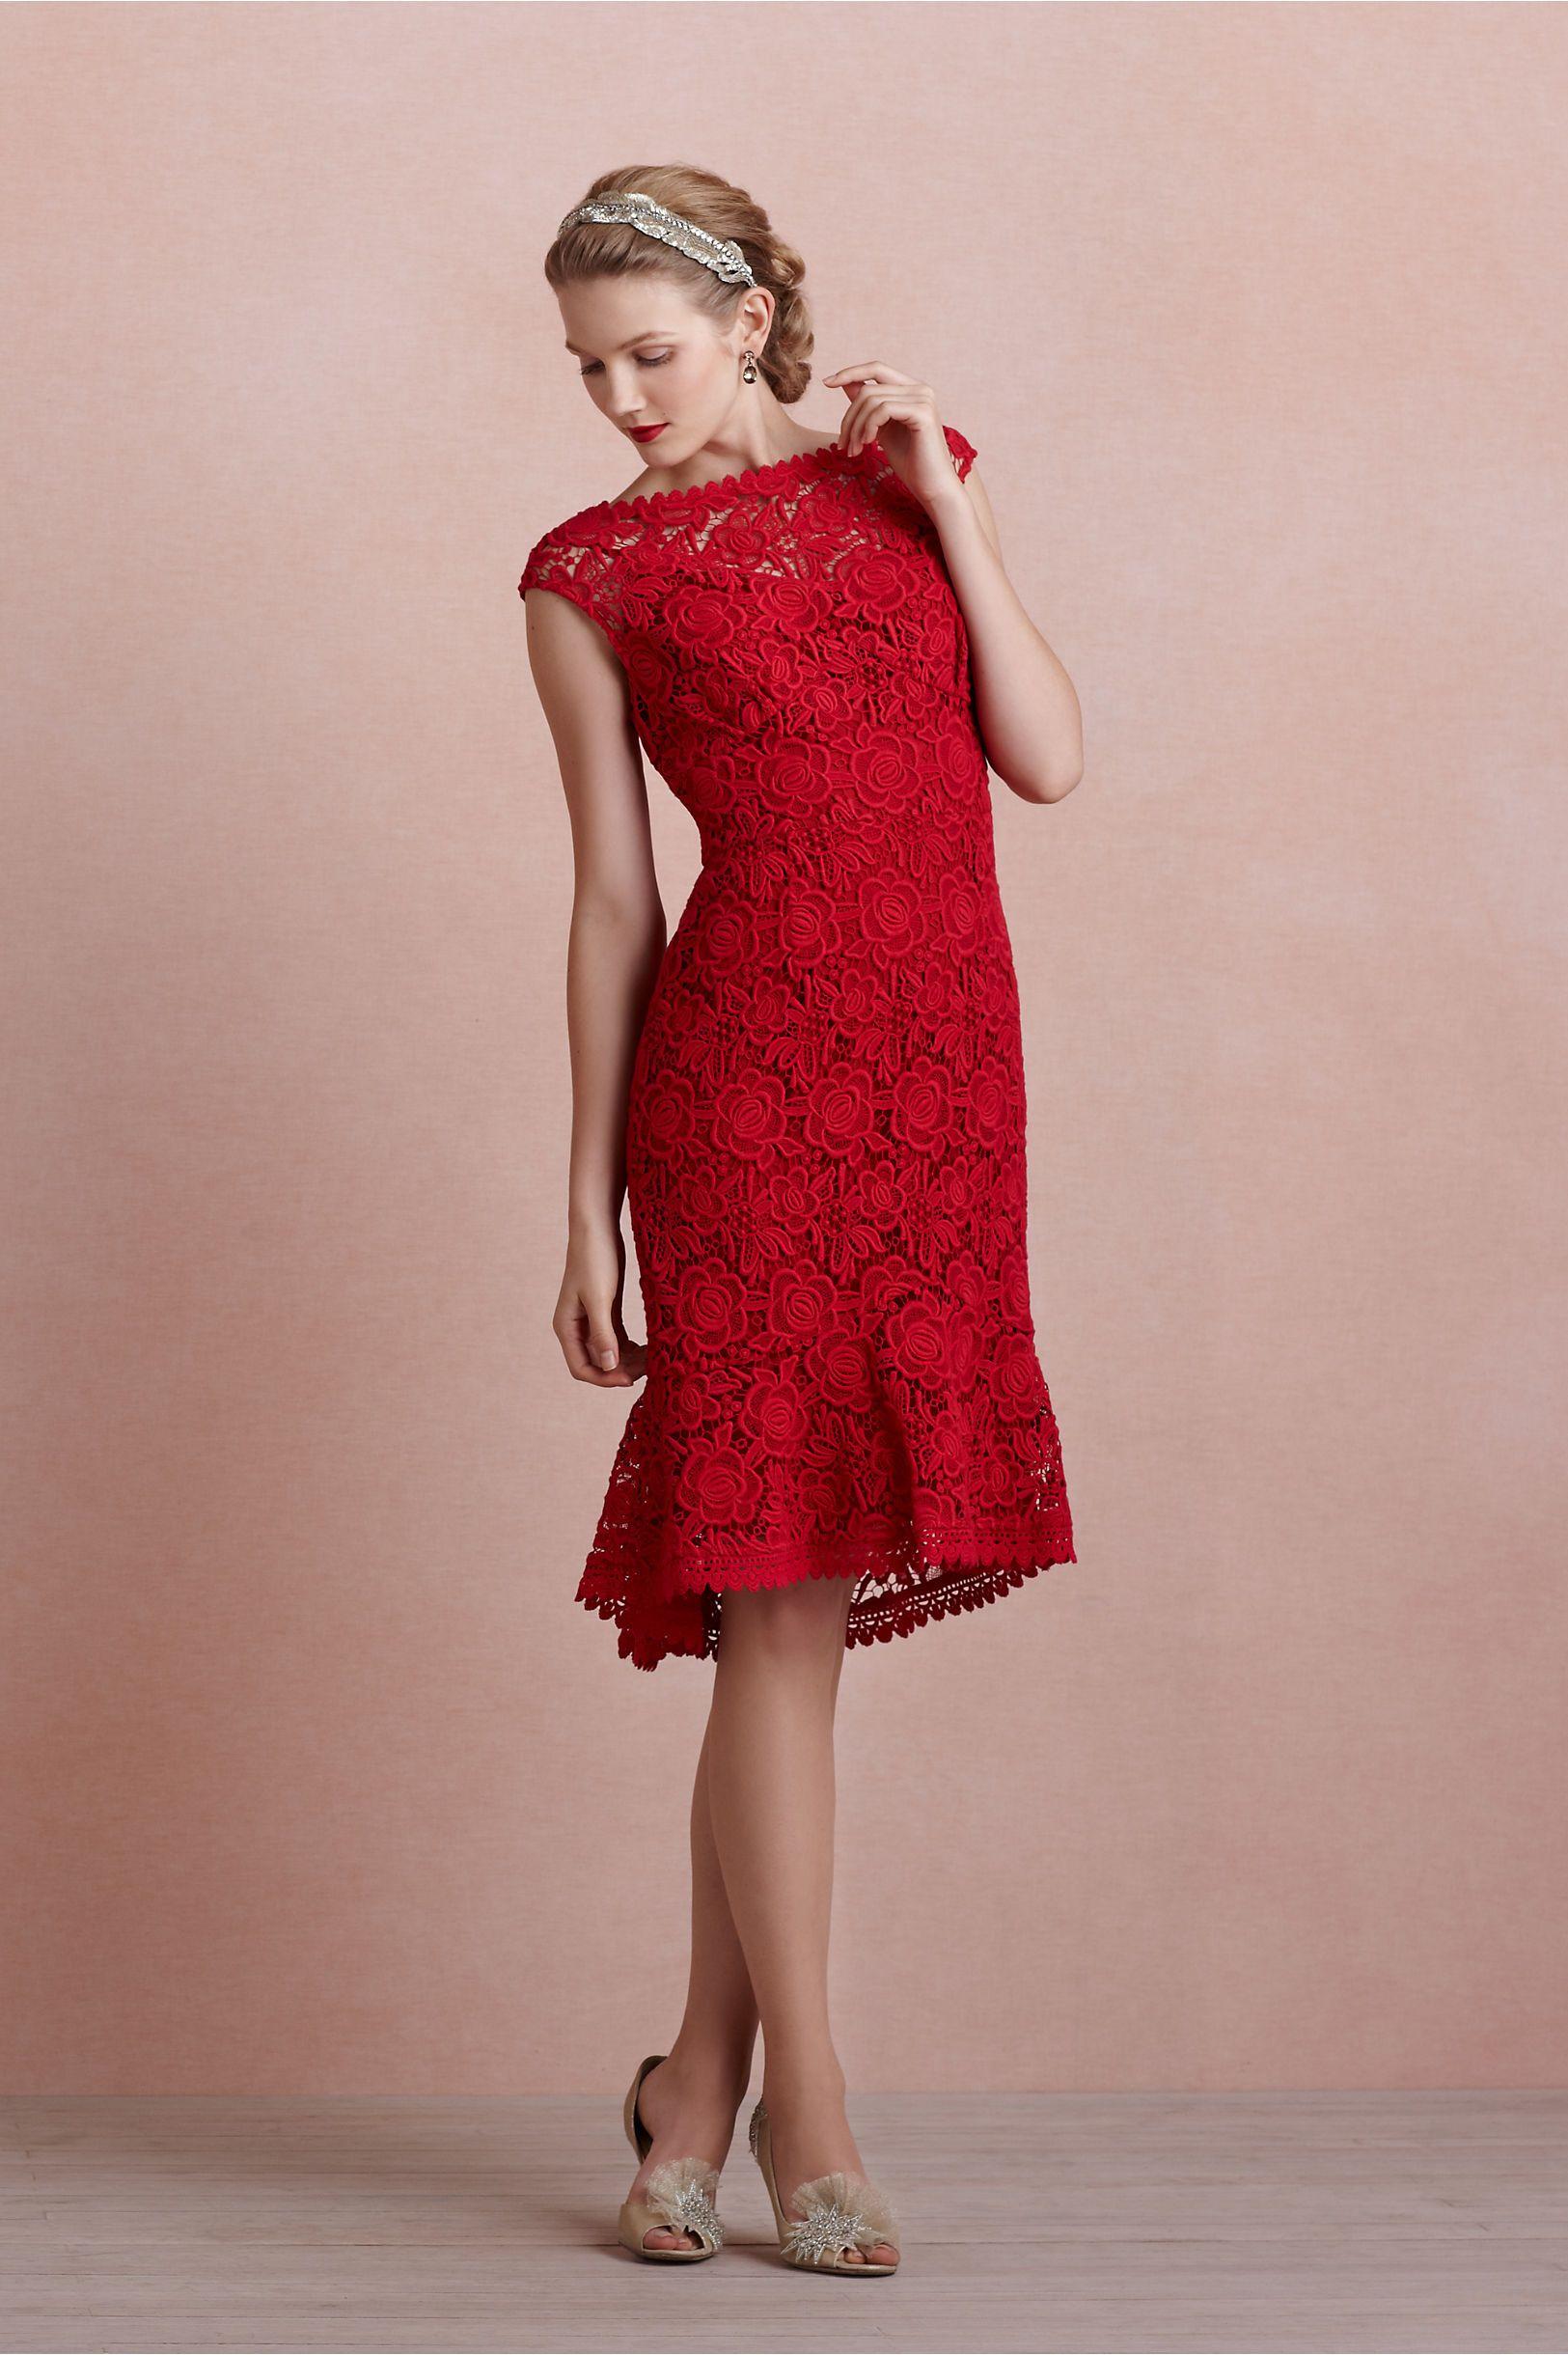 Cinnabar Dress at BHLDN   Wedding Apparel Ideas   Pinterest ...